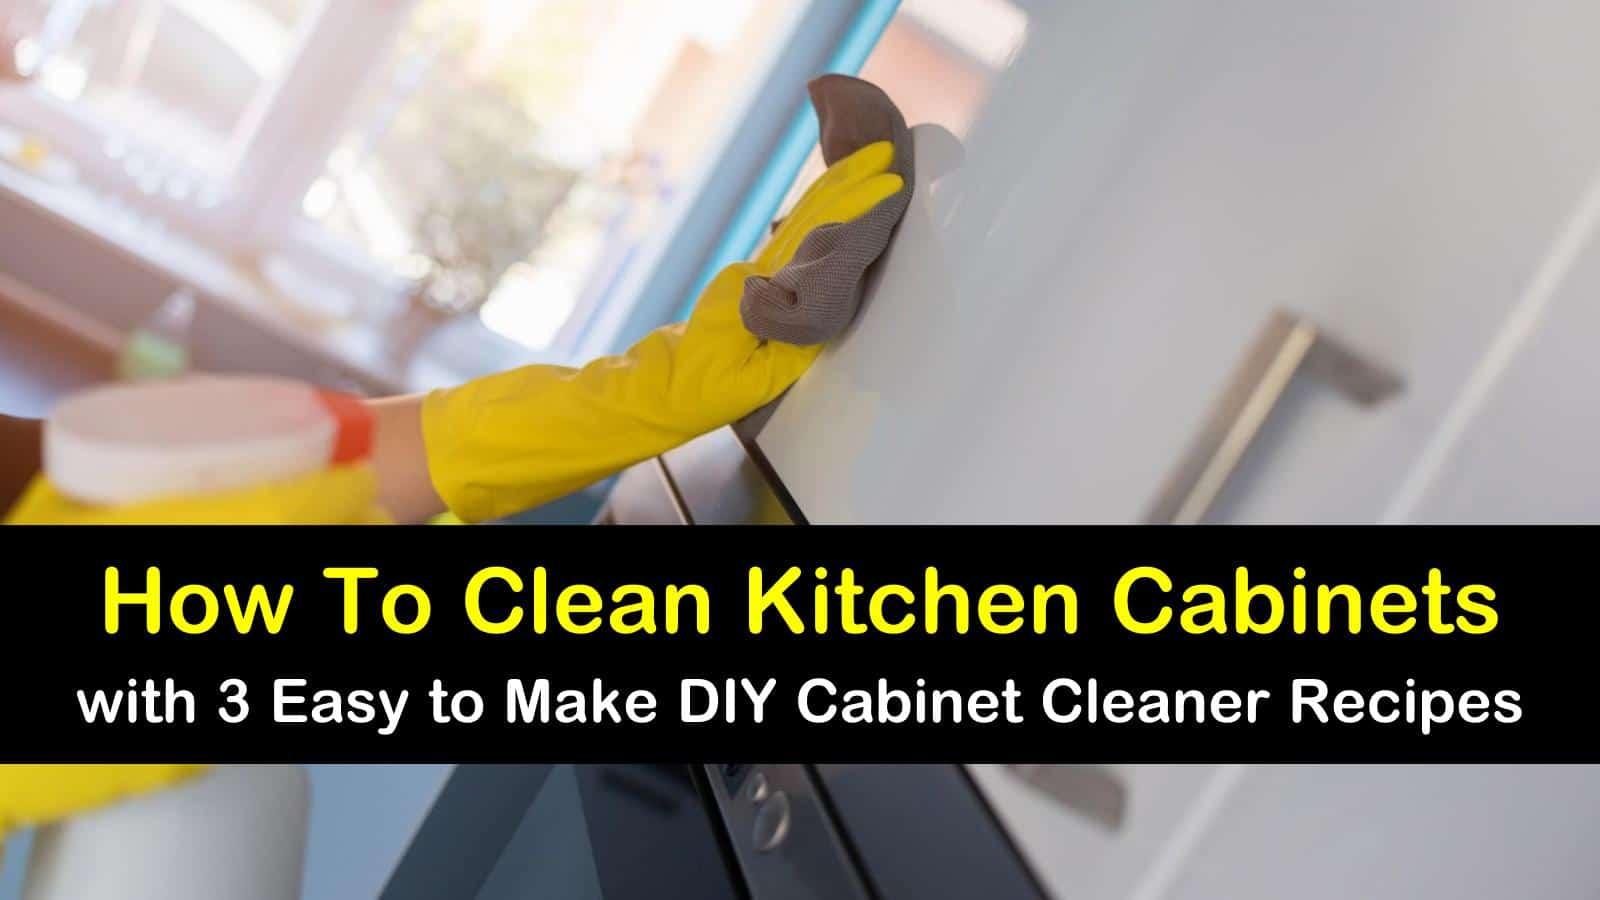 3 Easy Diy Ways To Clean Kitchen Cabinets